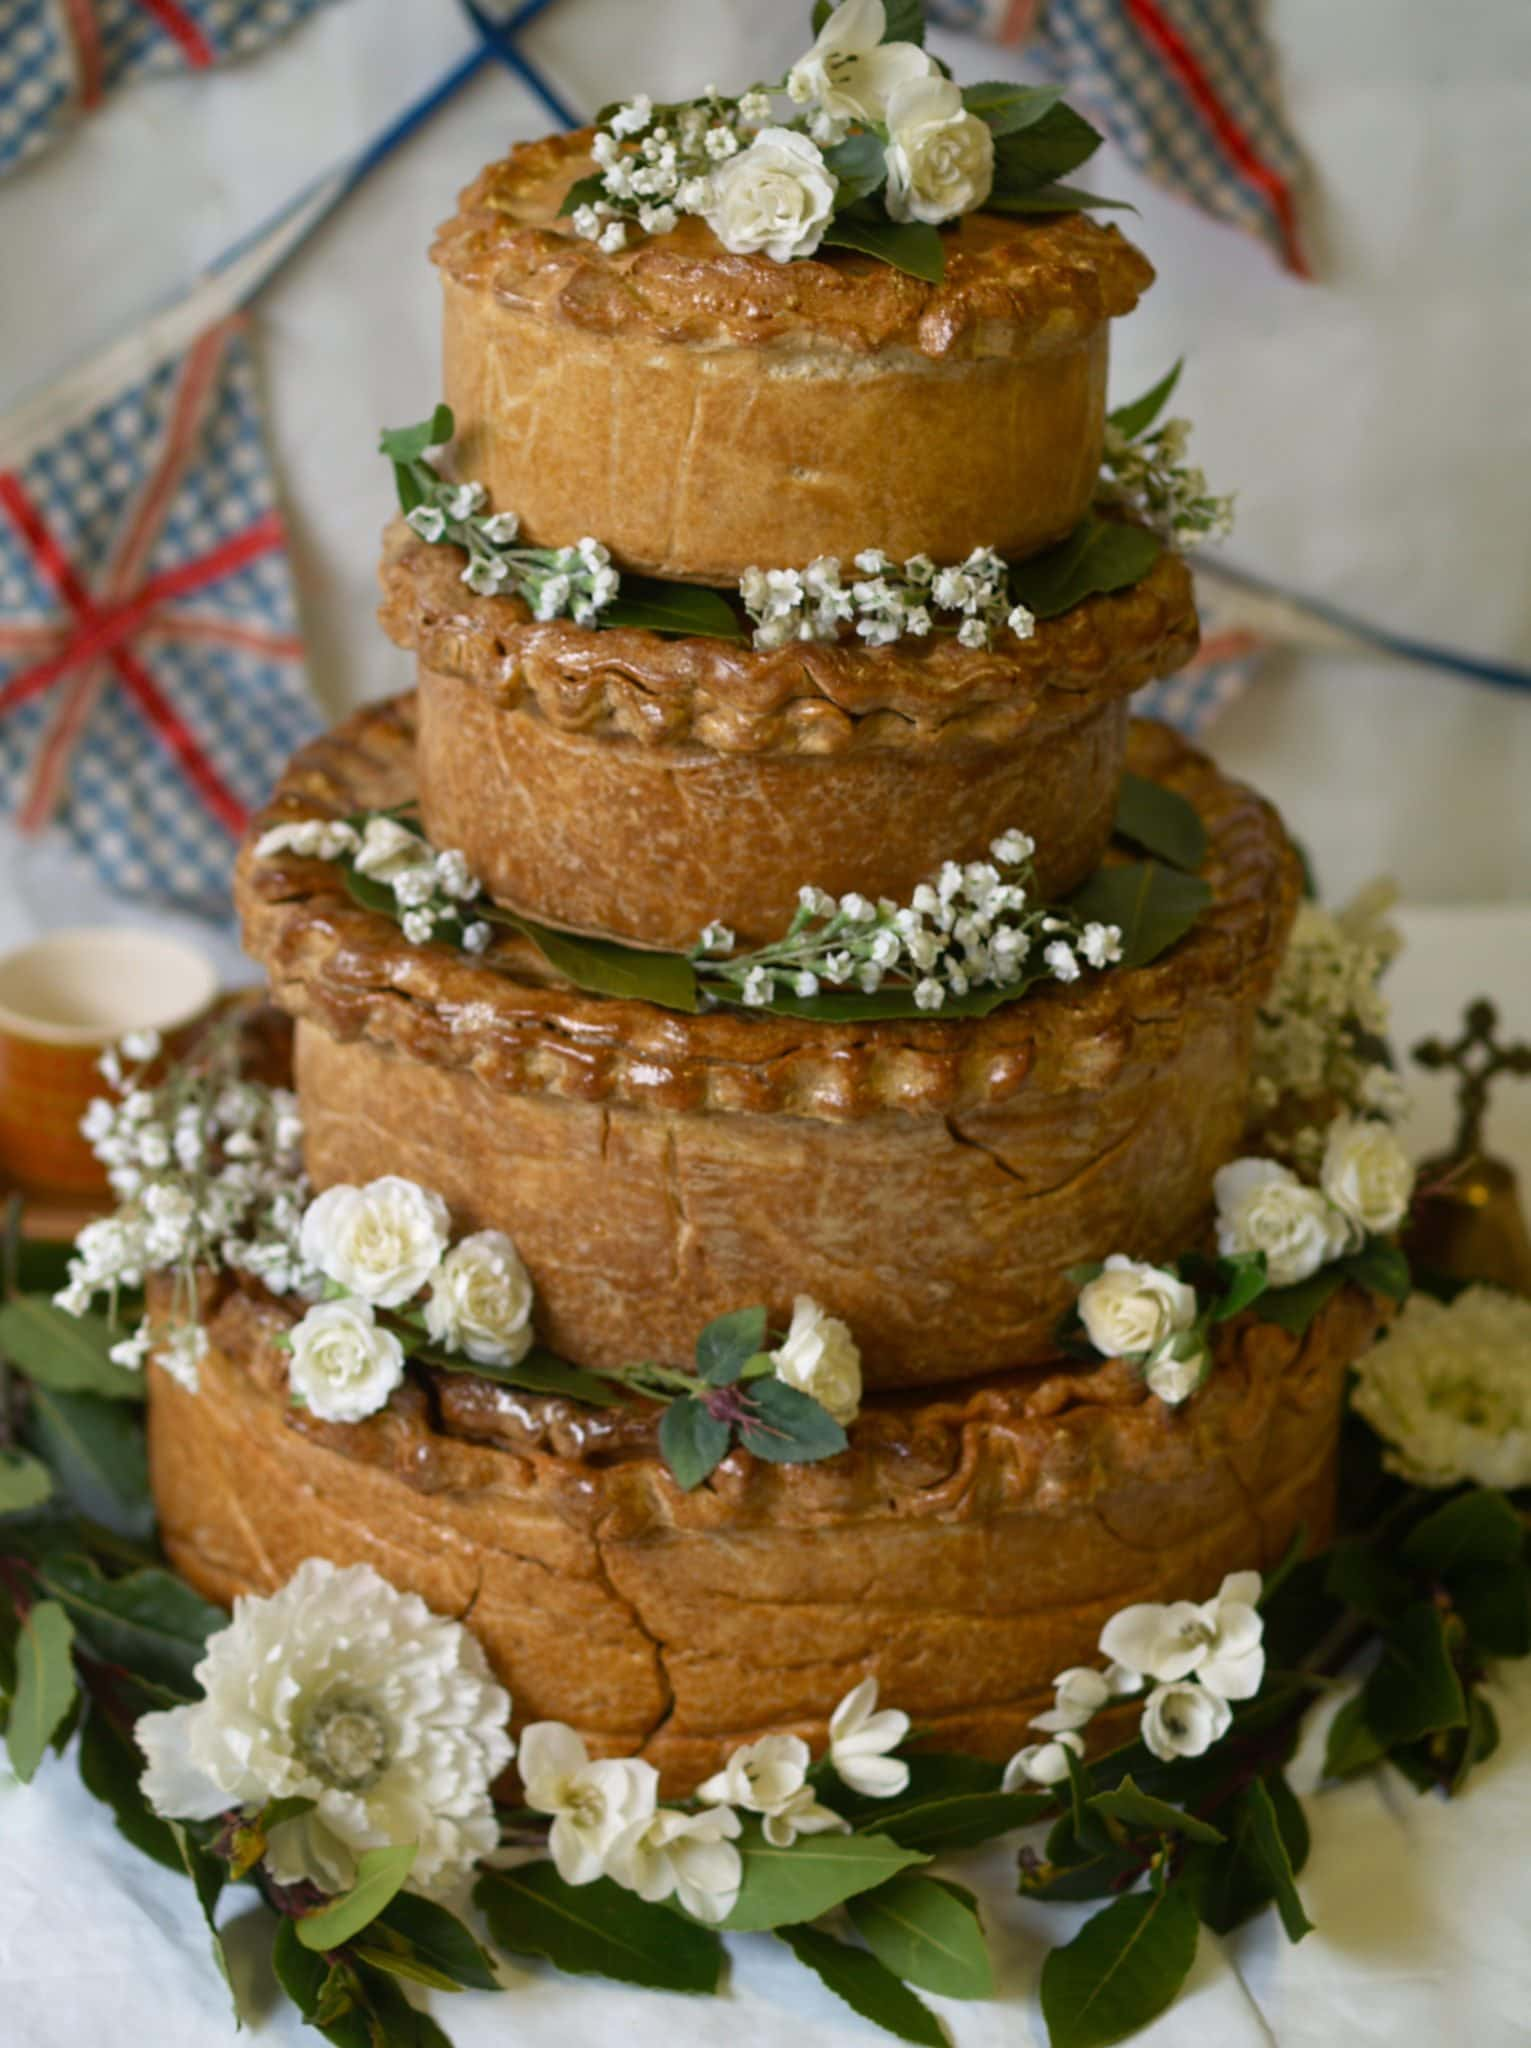 Tiered pork pie decorated with flowers - a savoury alternative to your wedding cake.